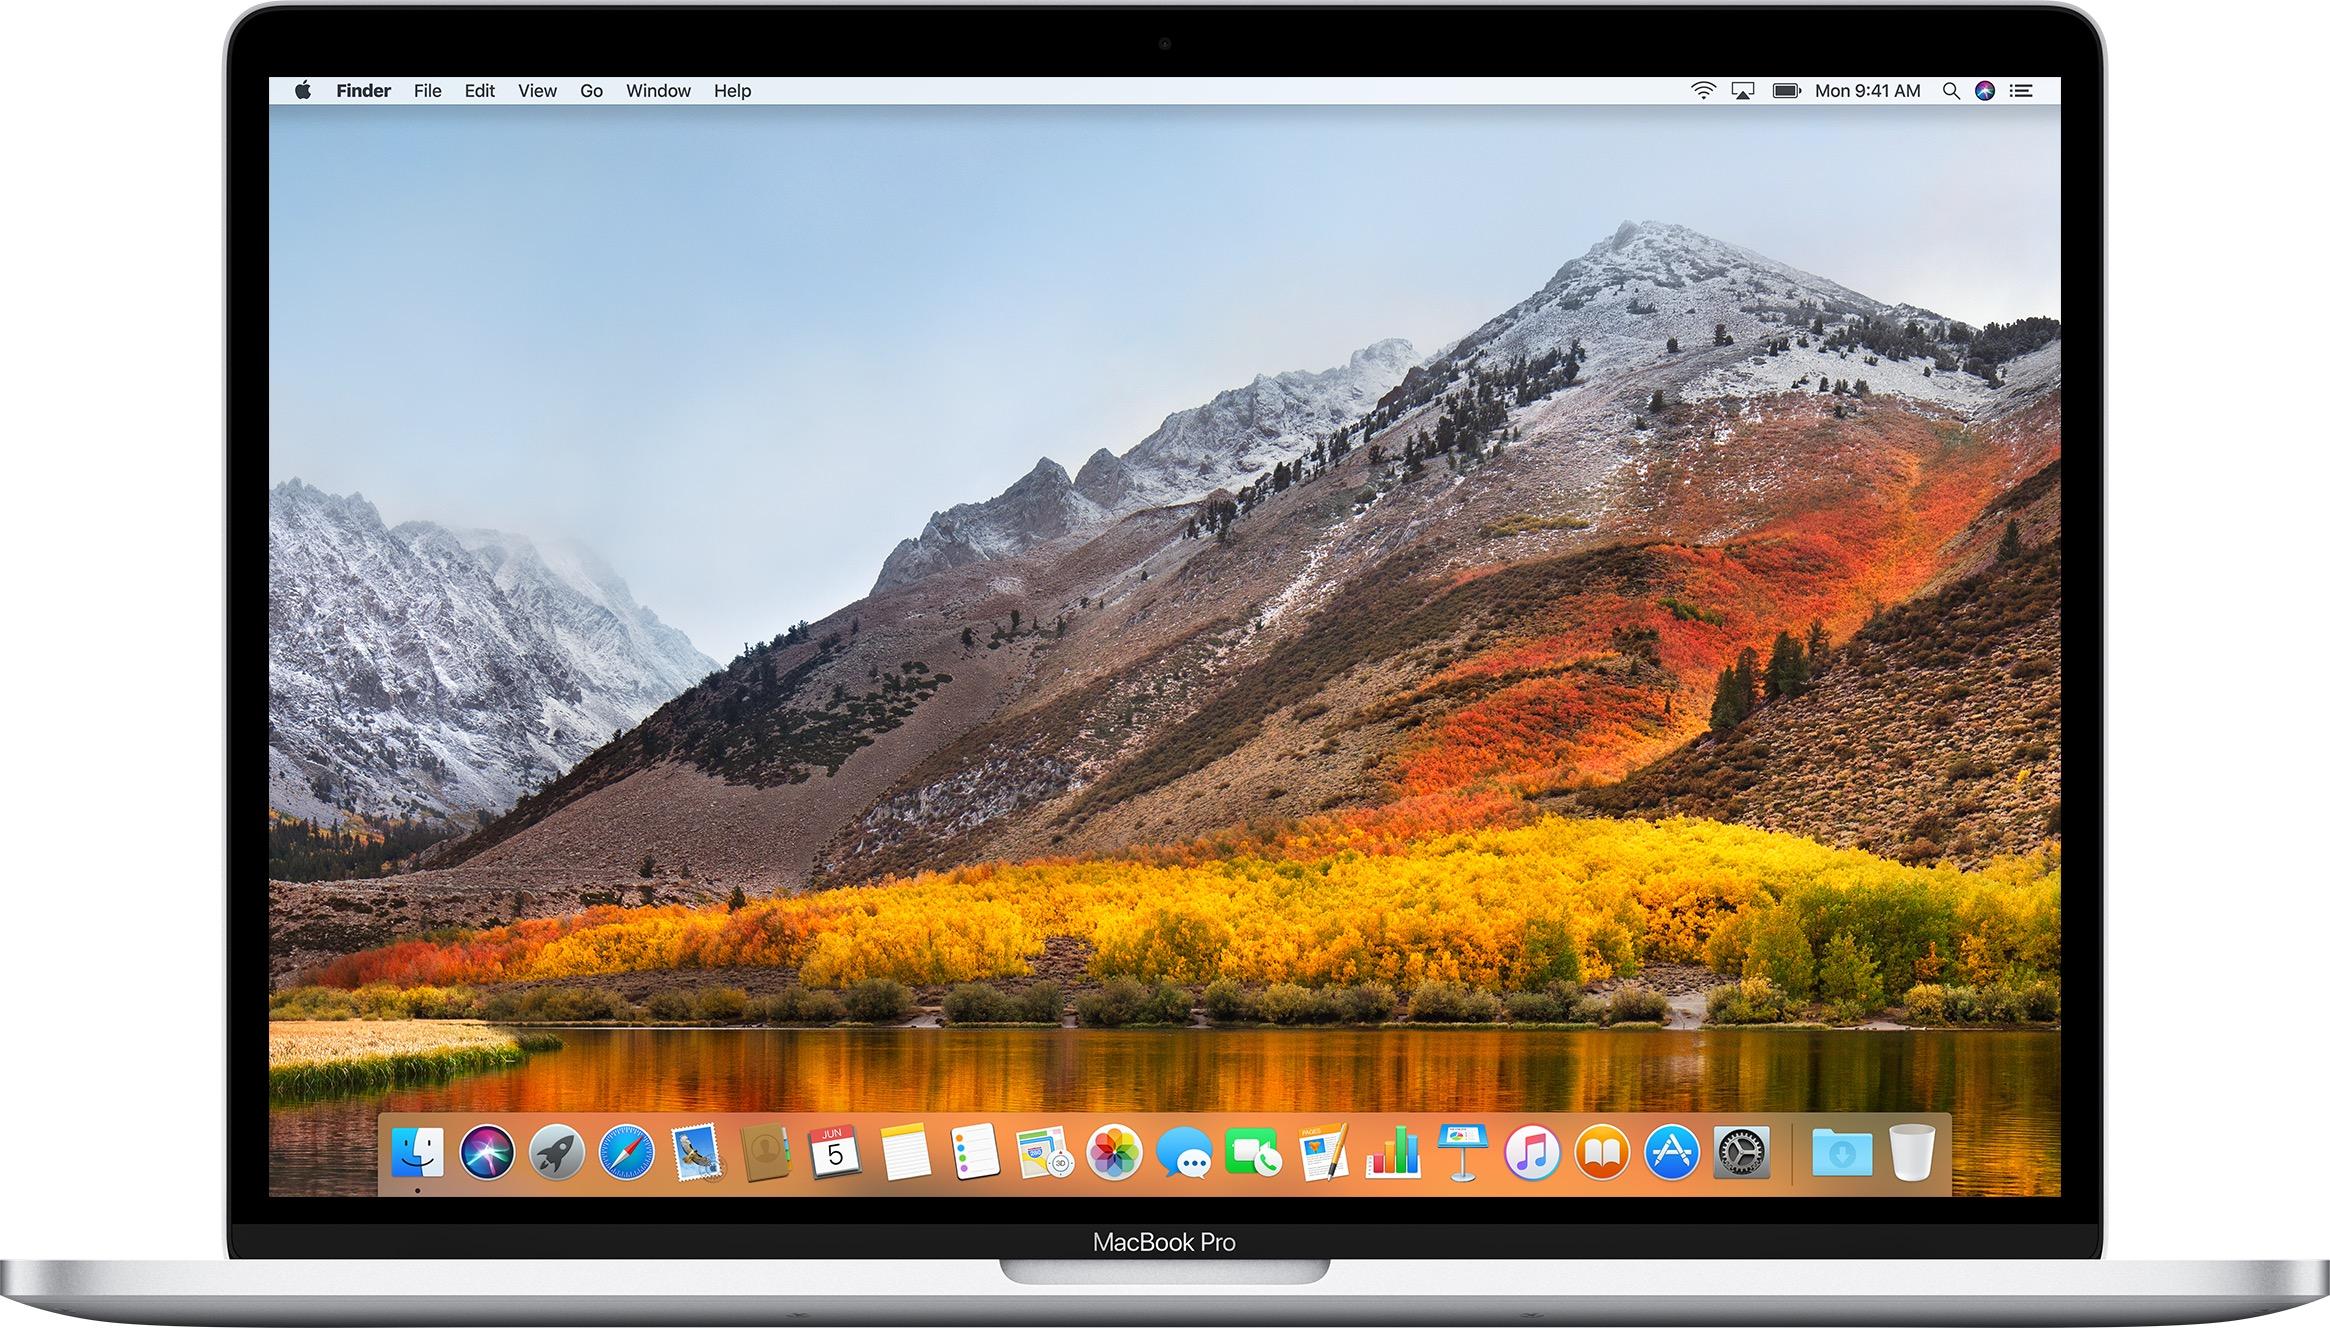 MacBook Pro rodando o macOS High Sierra